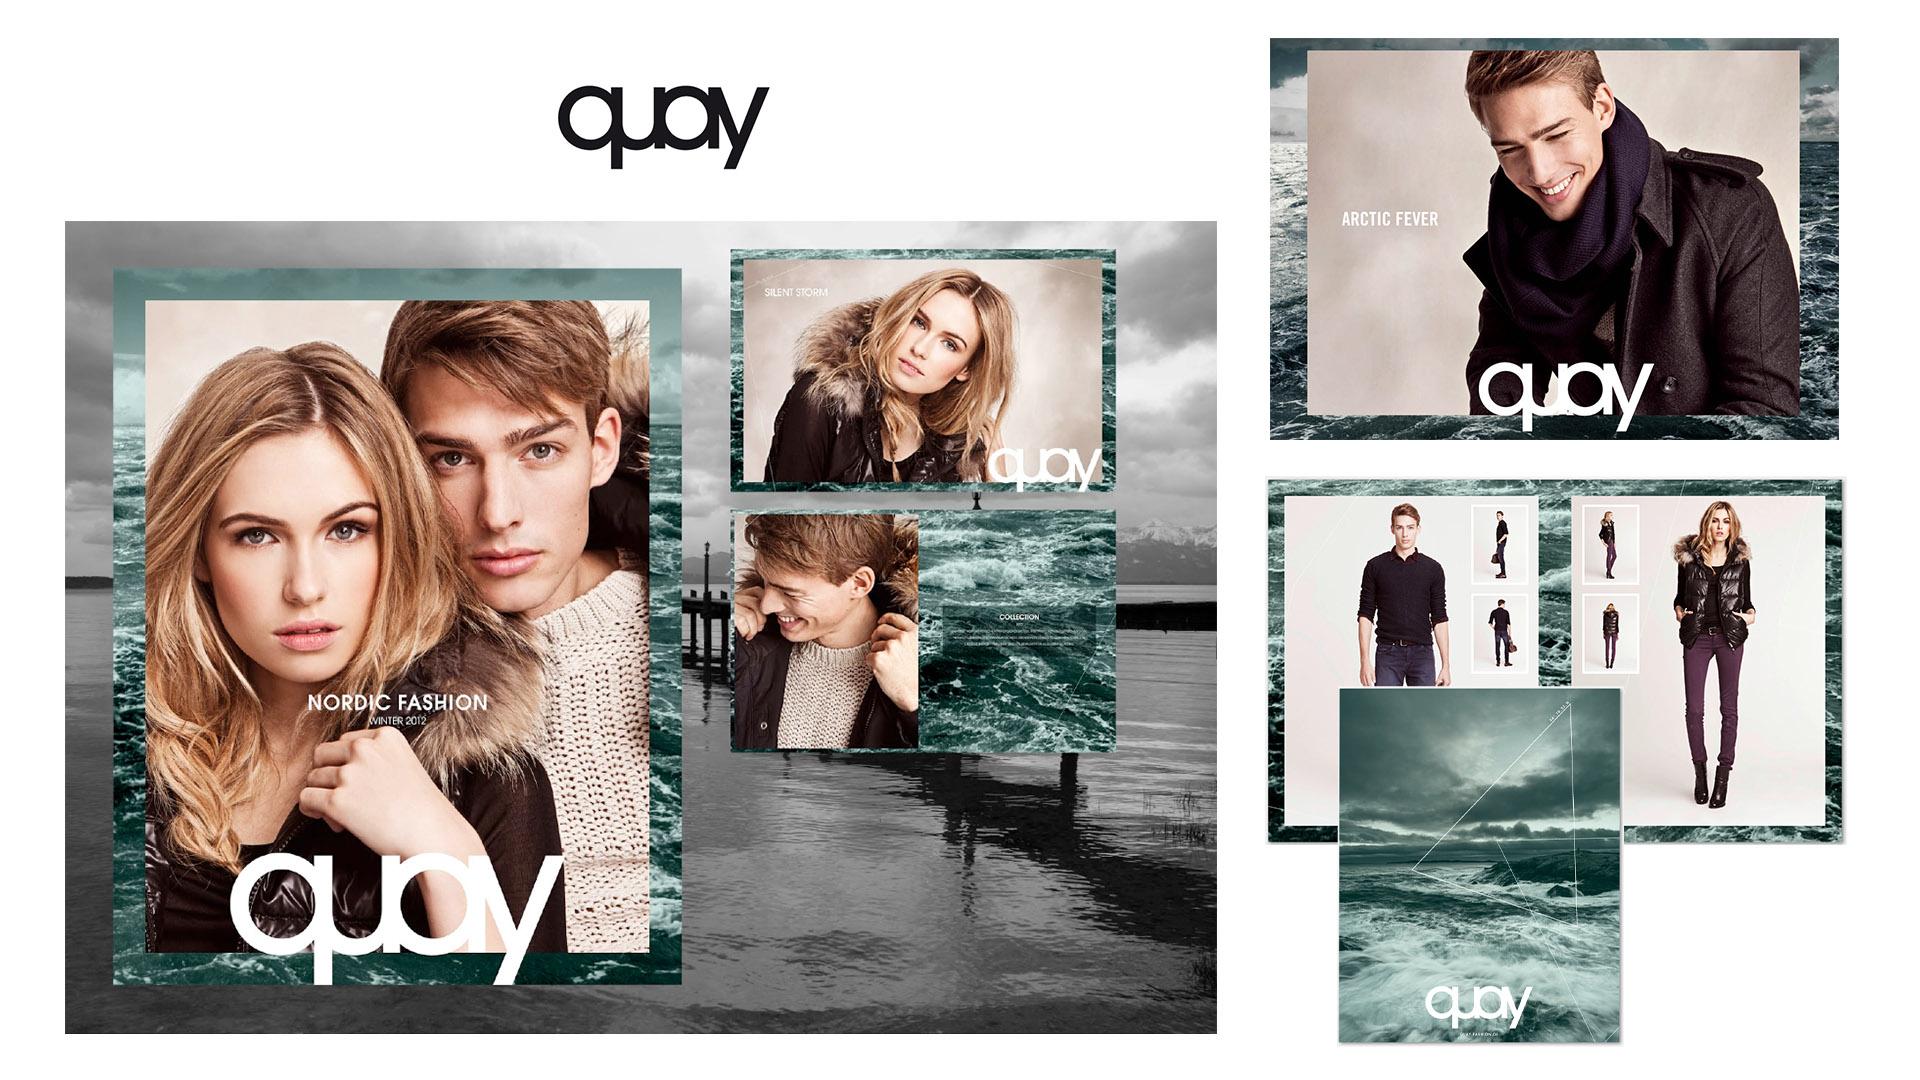 030216_16_9_Fashion_sheets_0000_quay1